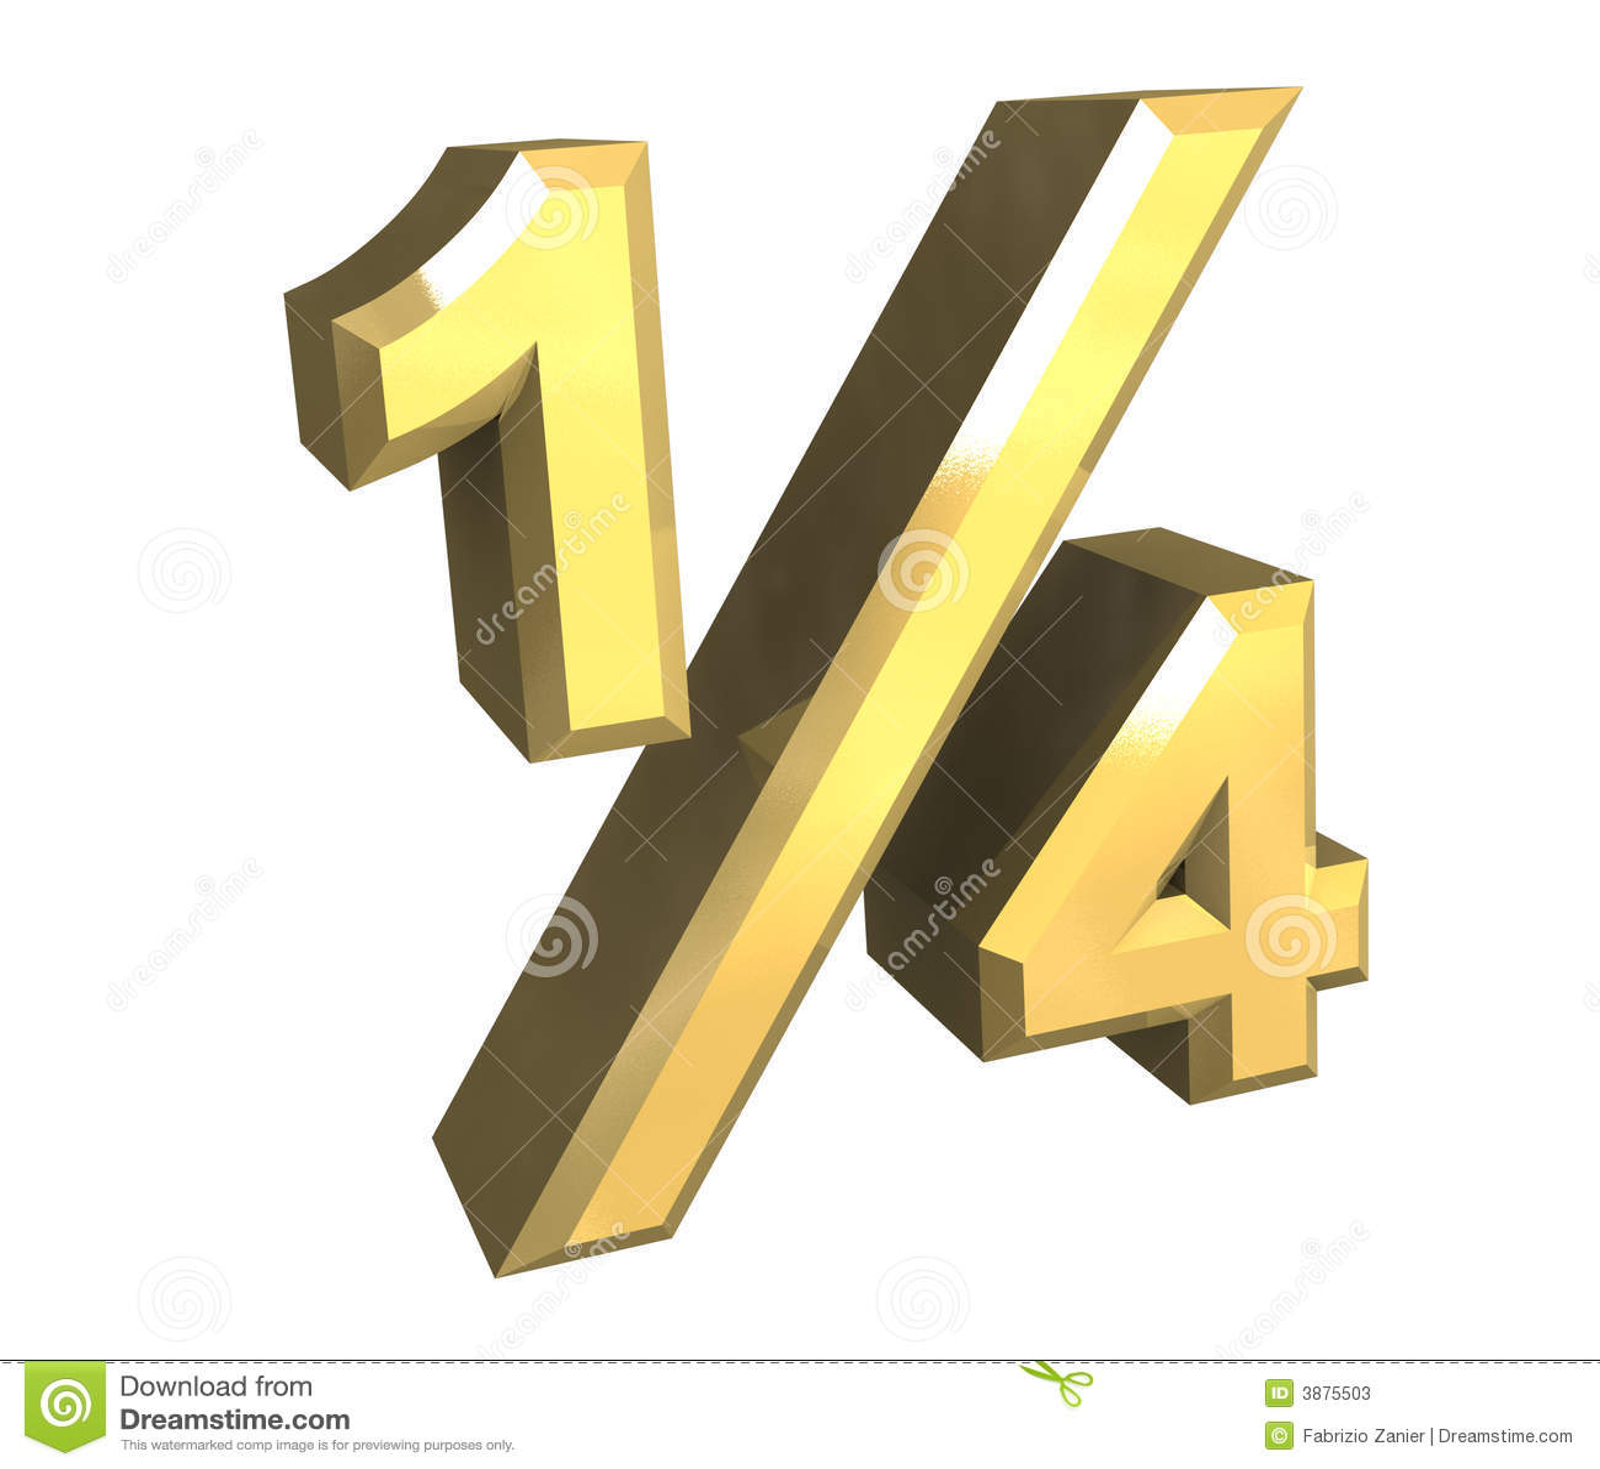 1 4 one quarter in gold 3d stock photos image 3875503. Black Bedroom Furniture Sets. Home Design Ideas